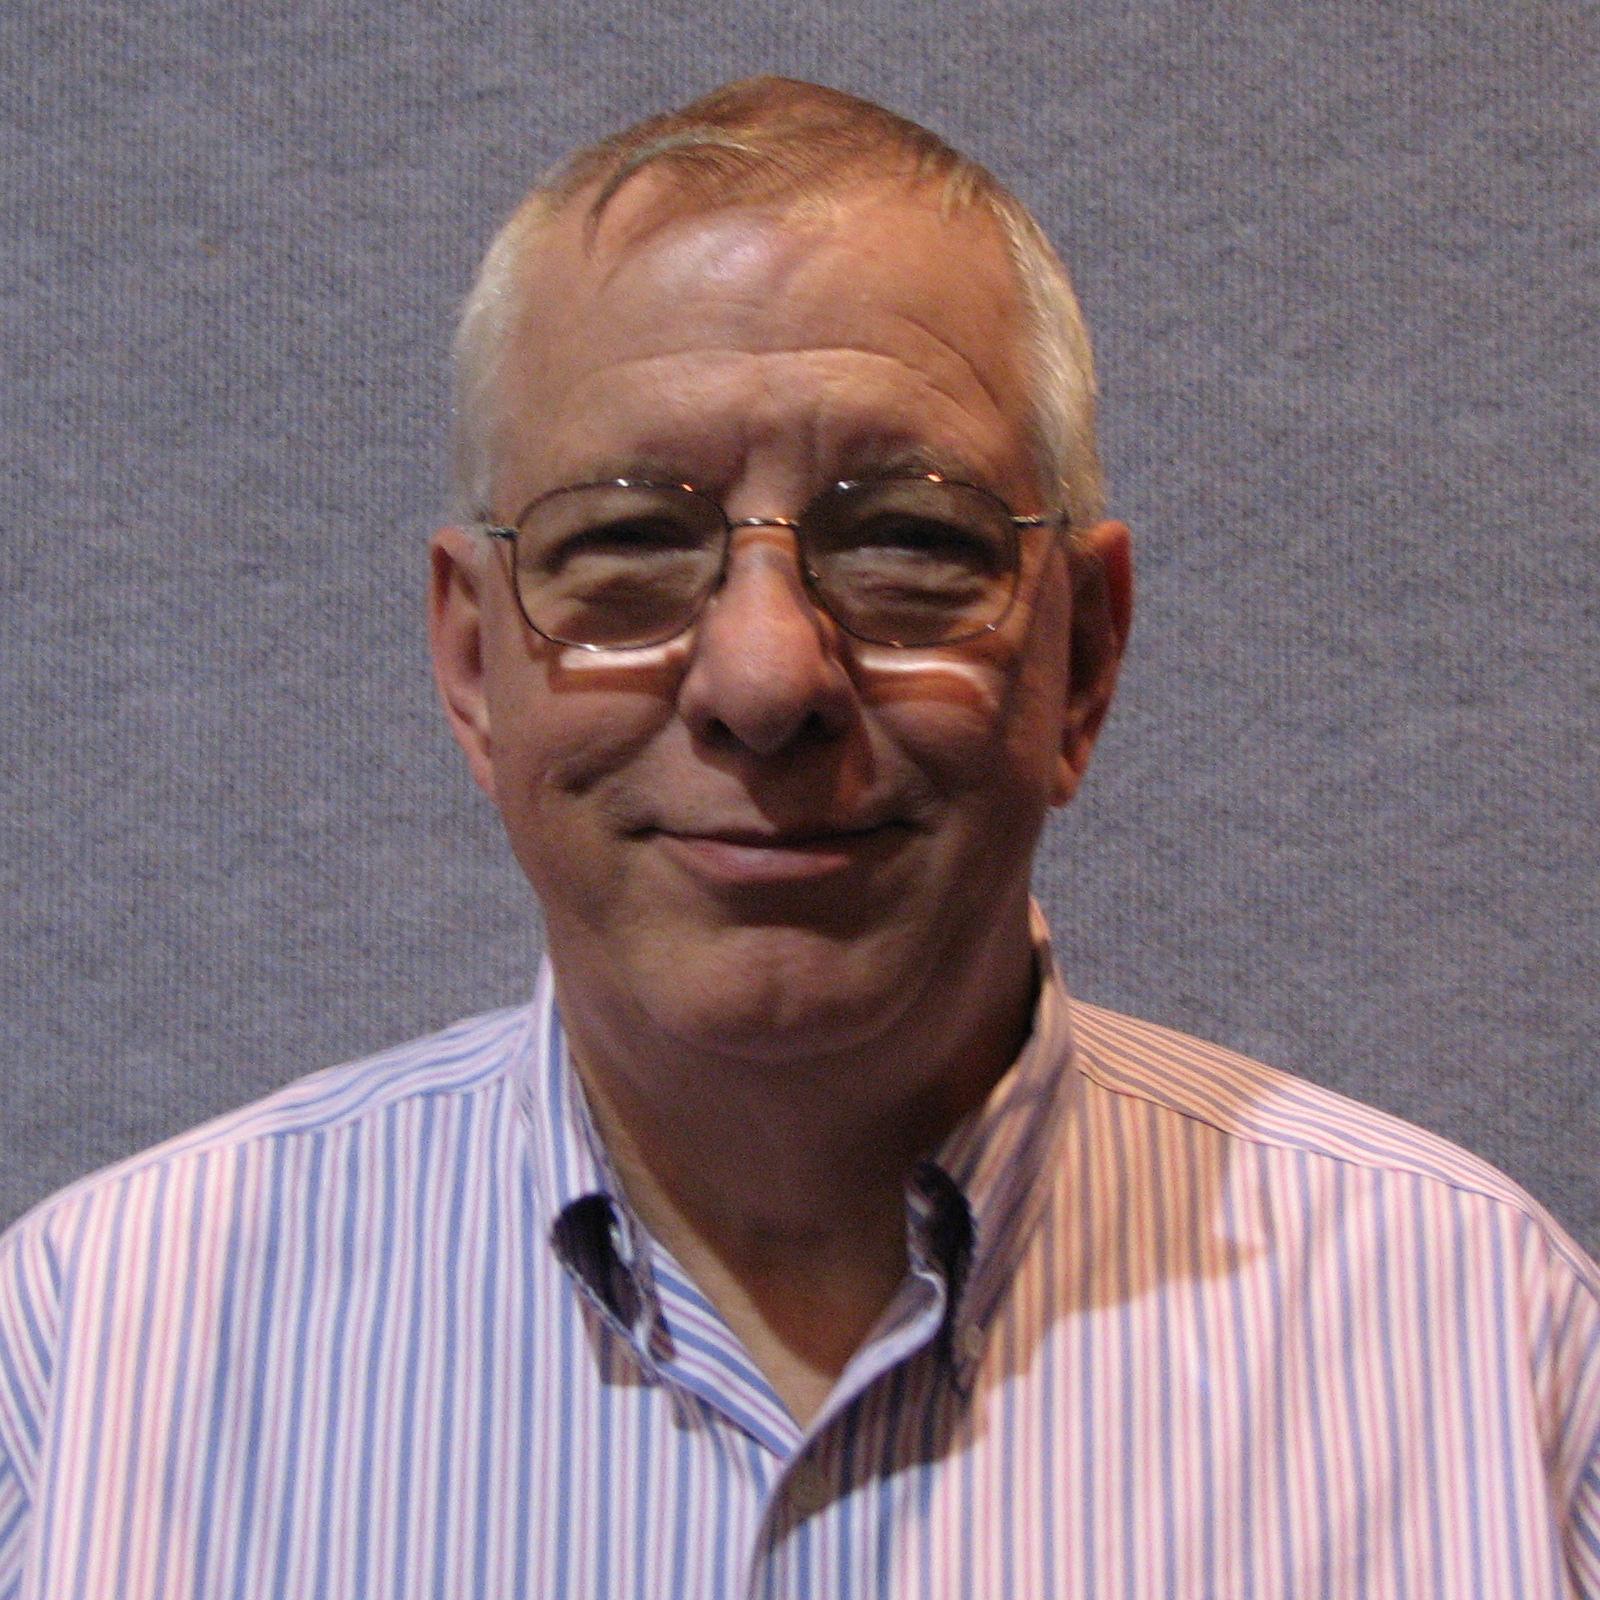 Smith at Supercomputing in 2007